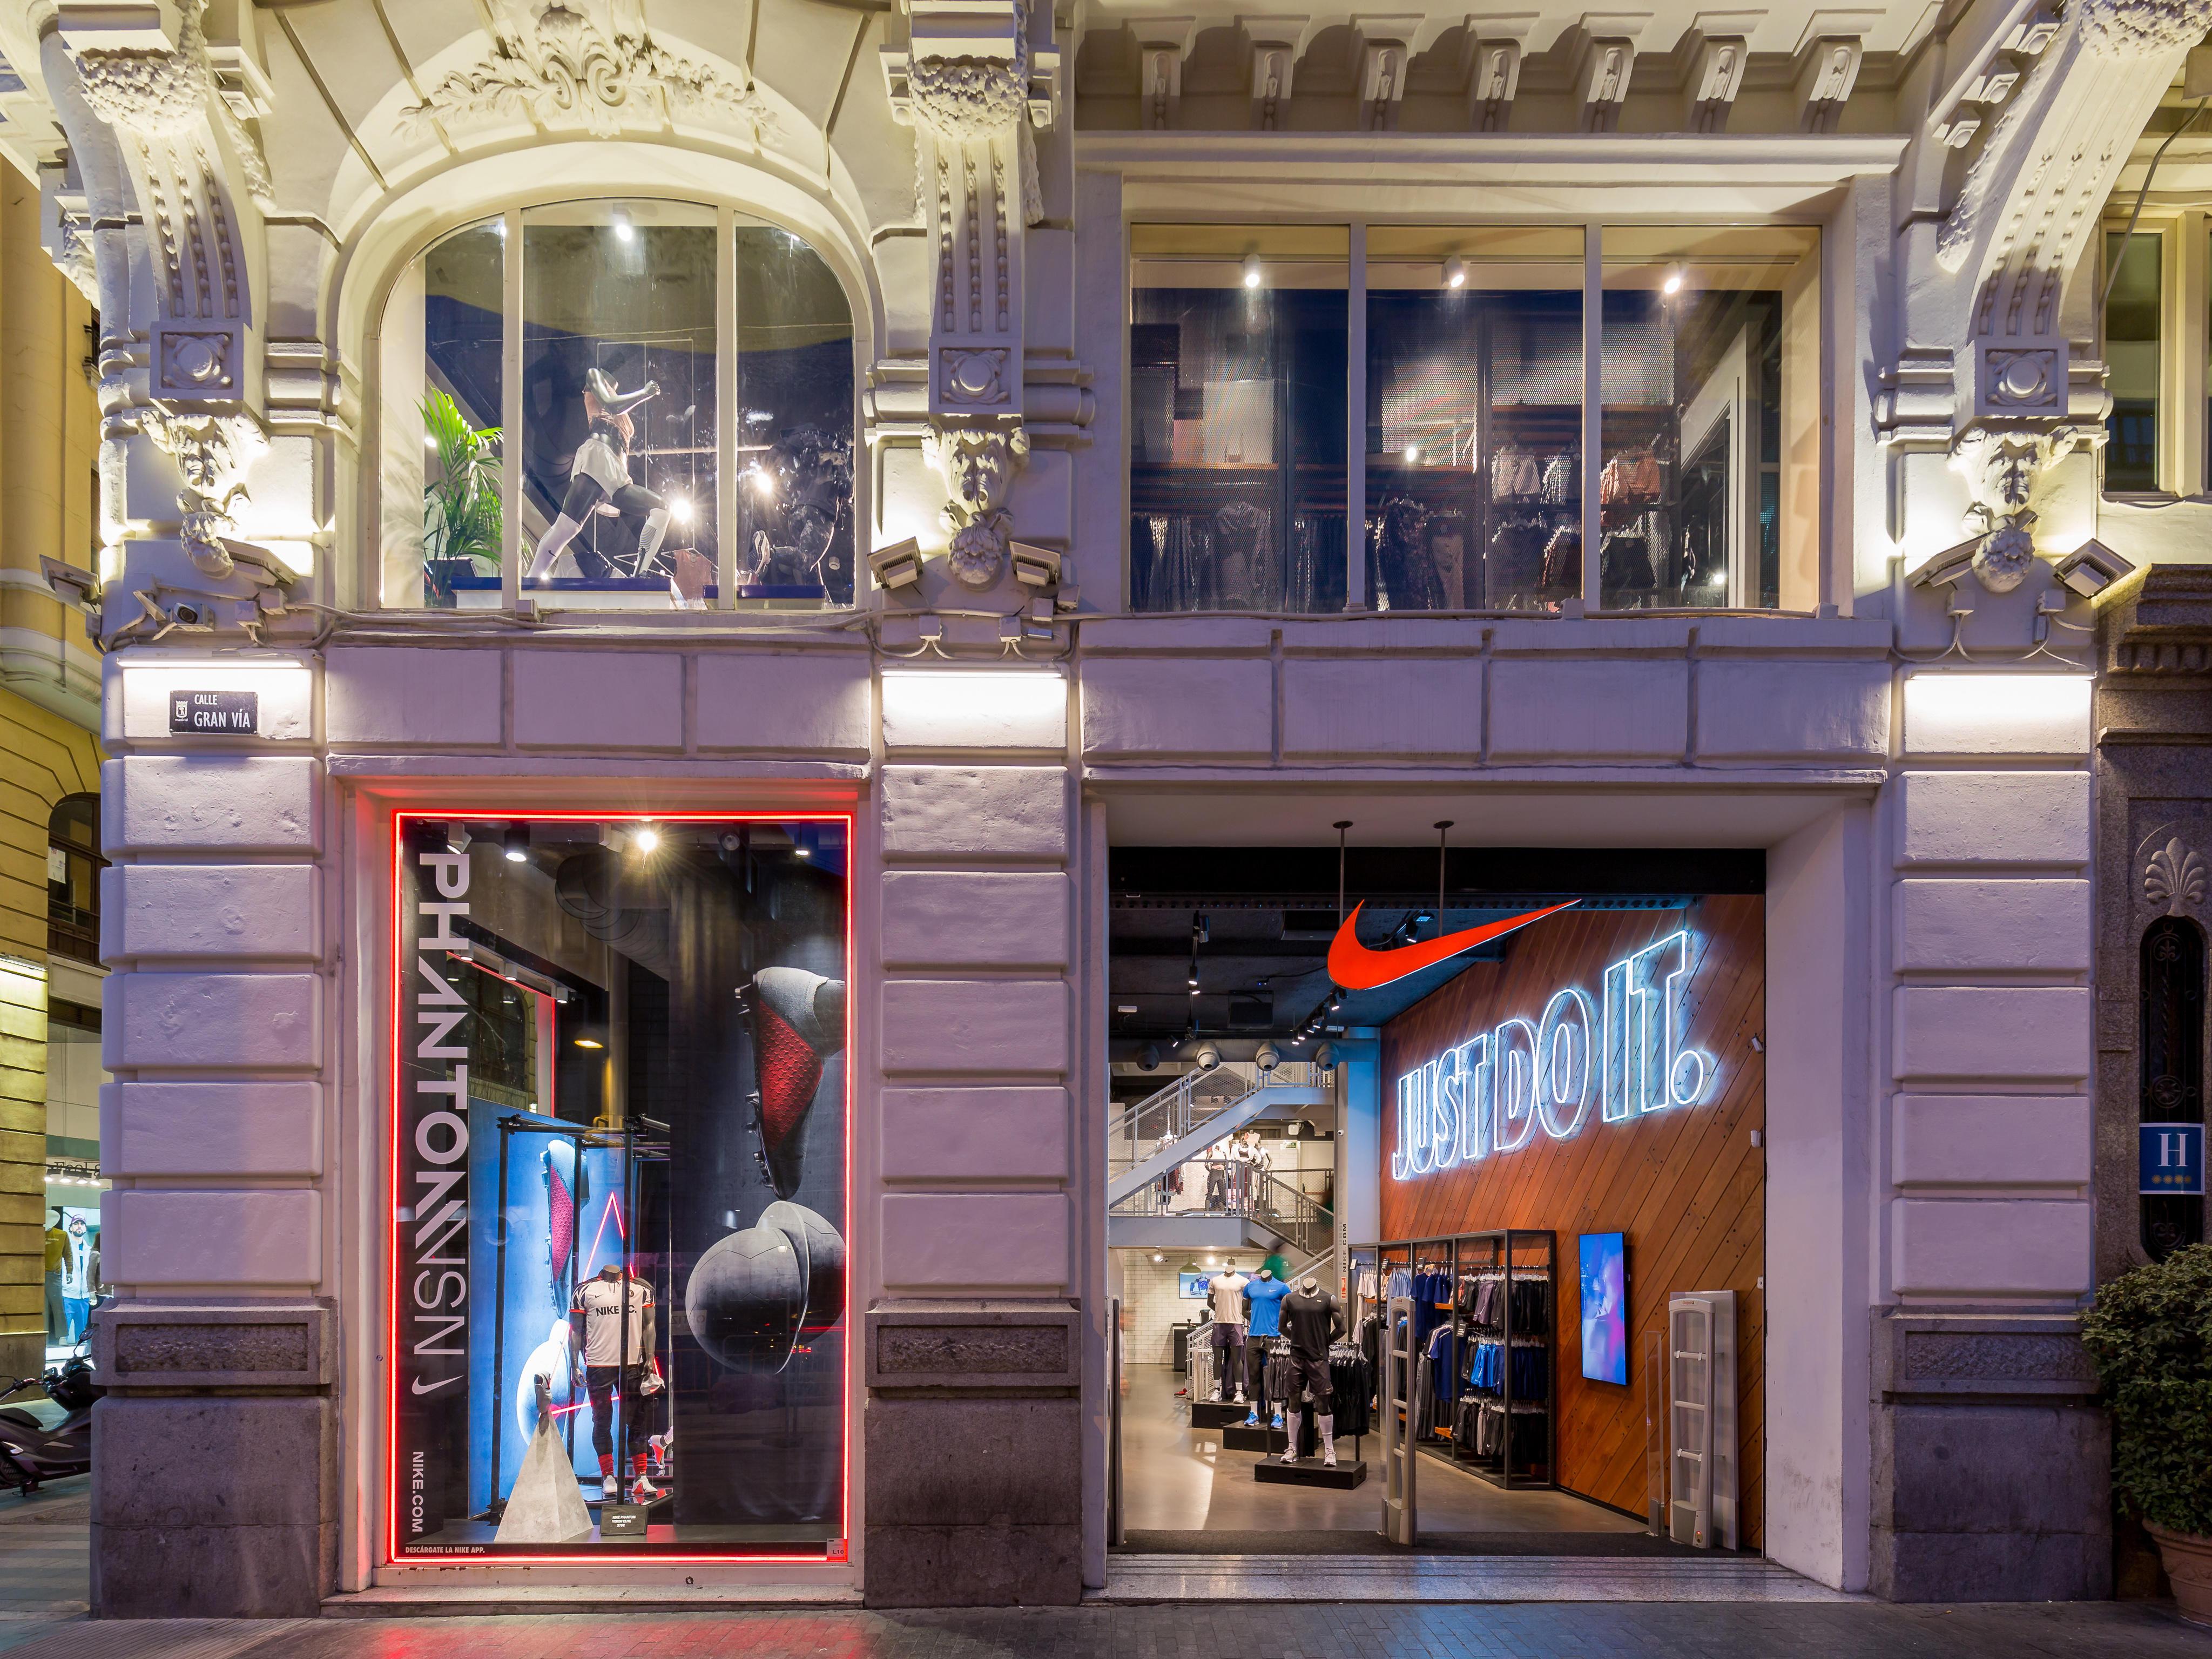 low priced c9594 f94e9 Nike store gran via ropa de deporte fabricantes mayoristas jpg 4096x3072  Calle gran via stores